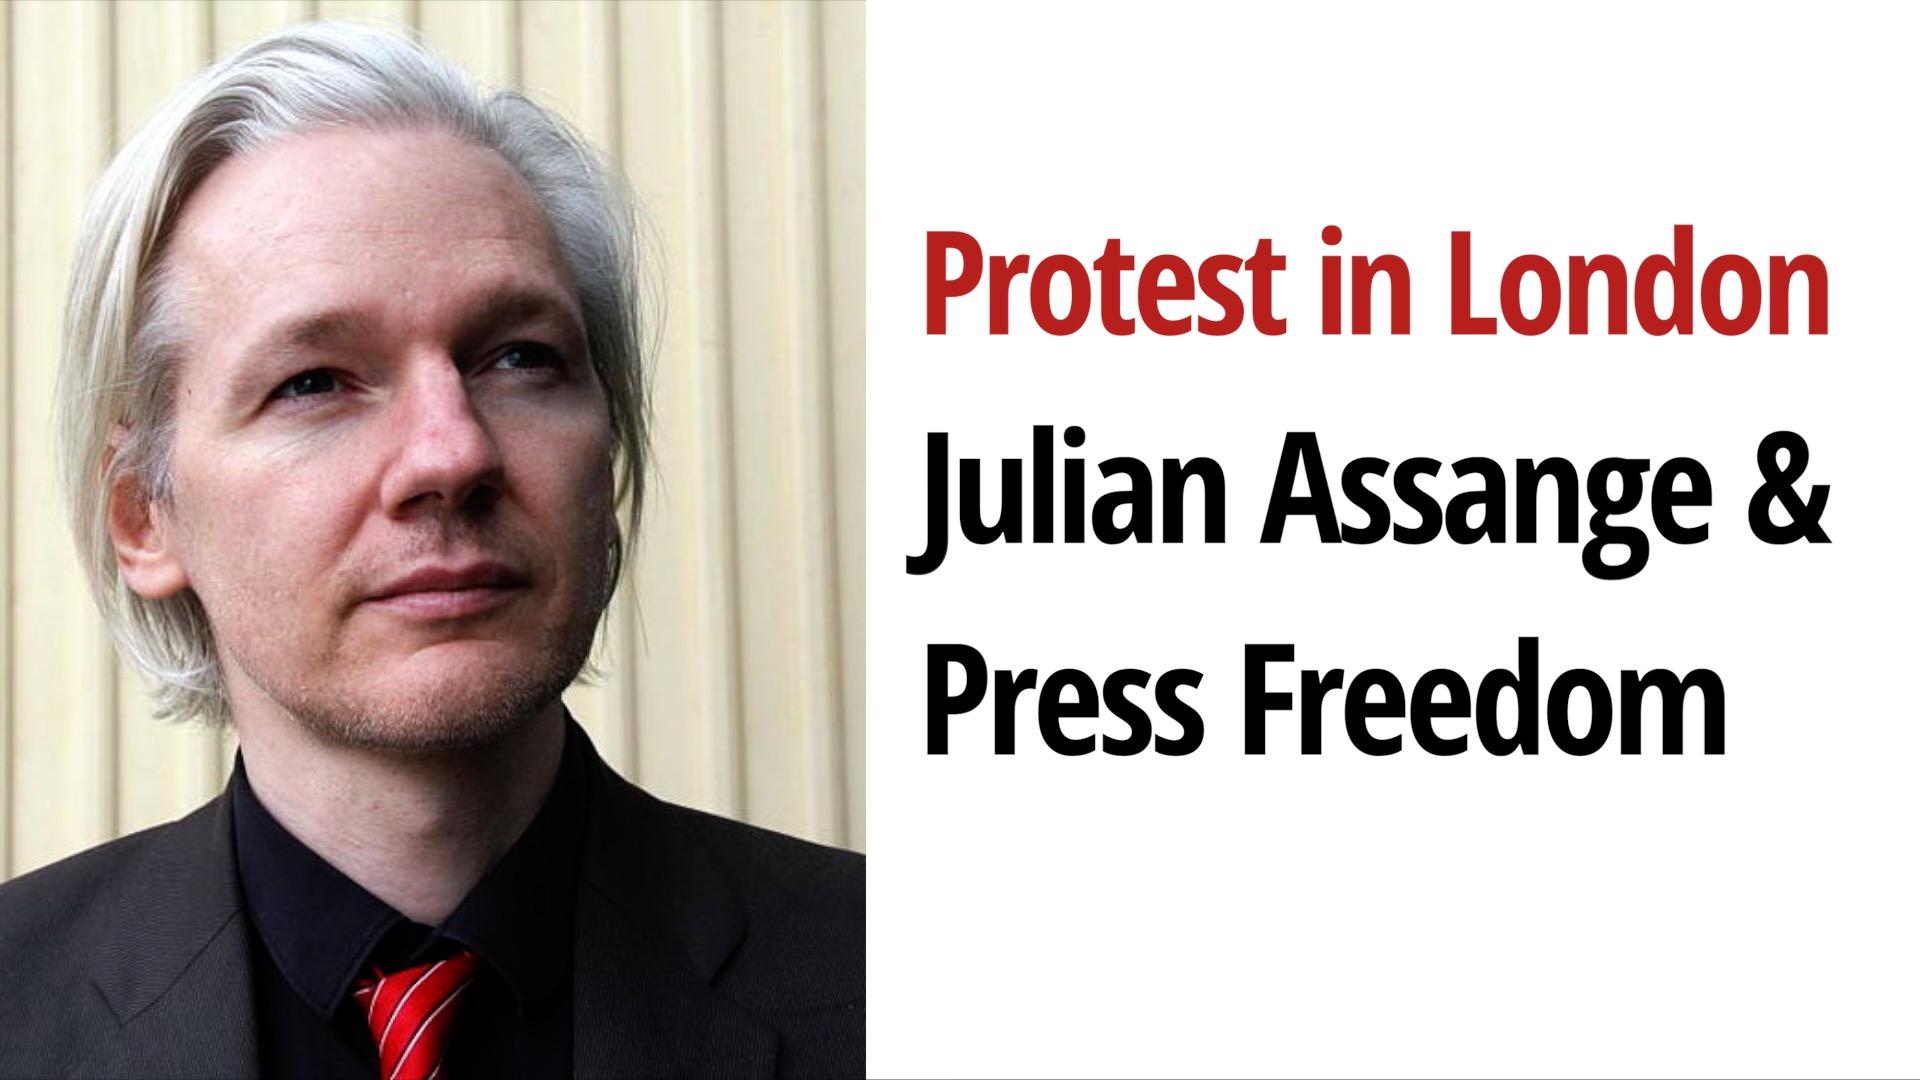 Press Freedom Julian Assange